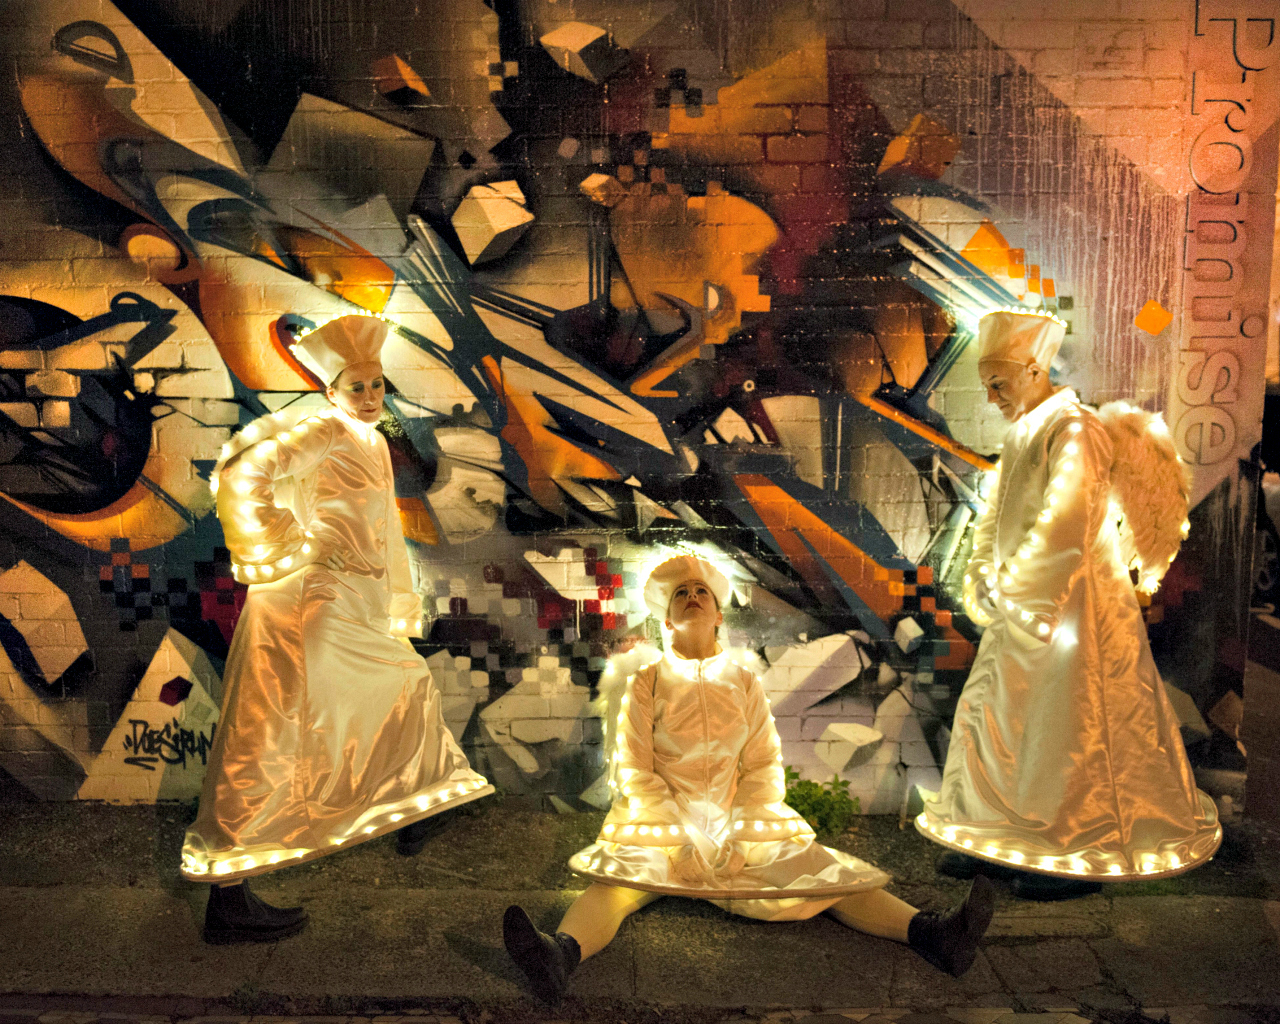 Angels Promise 1280 x 1024.jpg